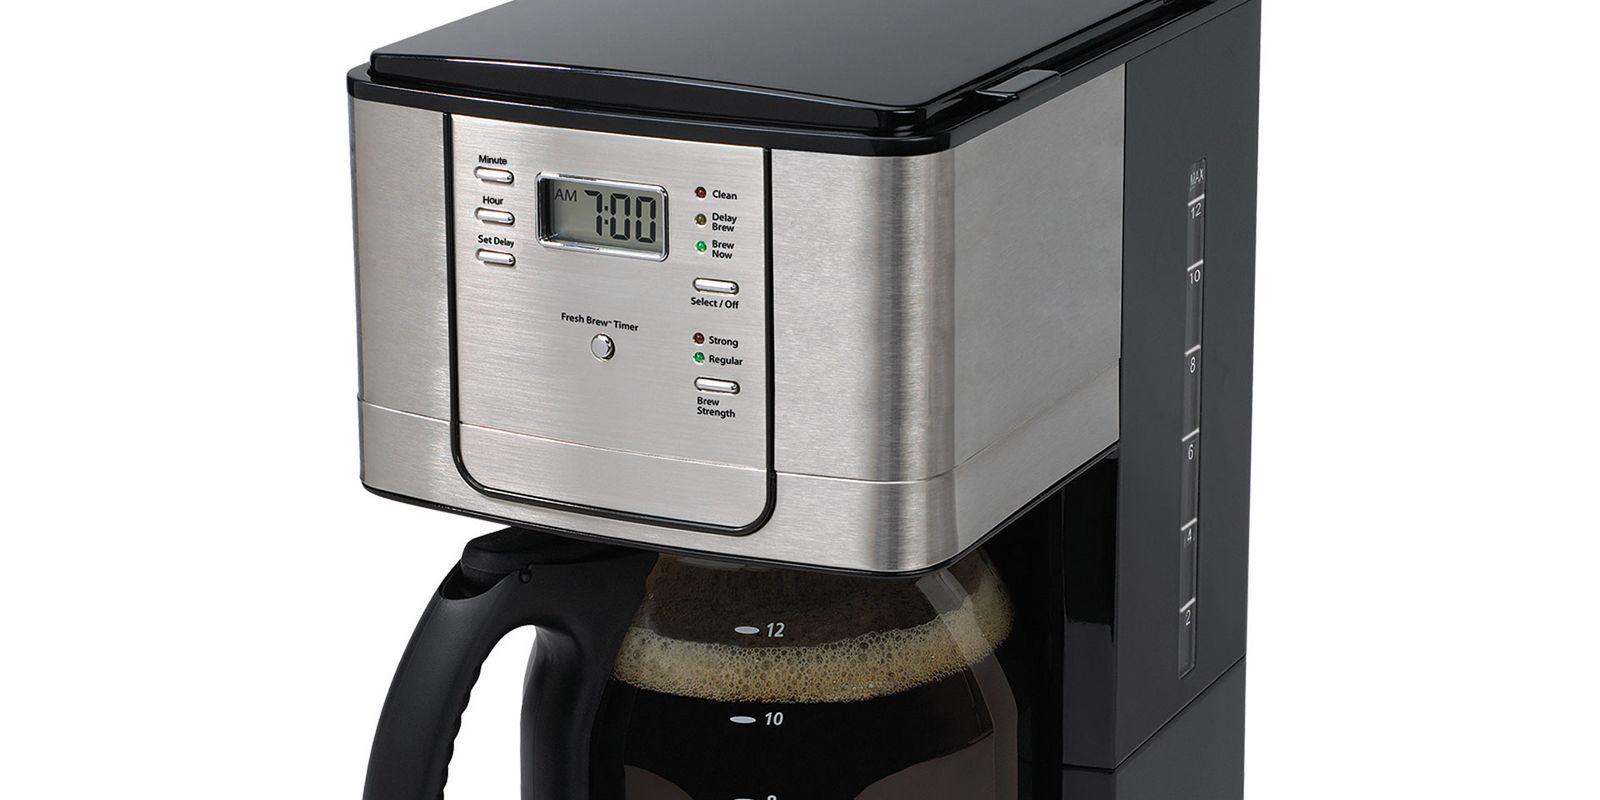 Good Housekeeping Coffee Maker Ratings : Mr. Coffee 12-Cup Programmable Coffeemaker #JWX31-NP Review